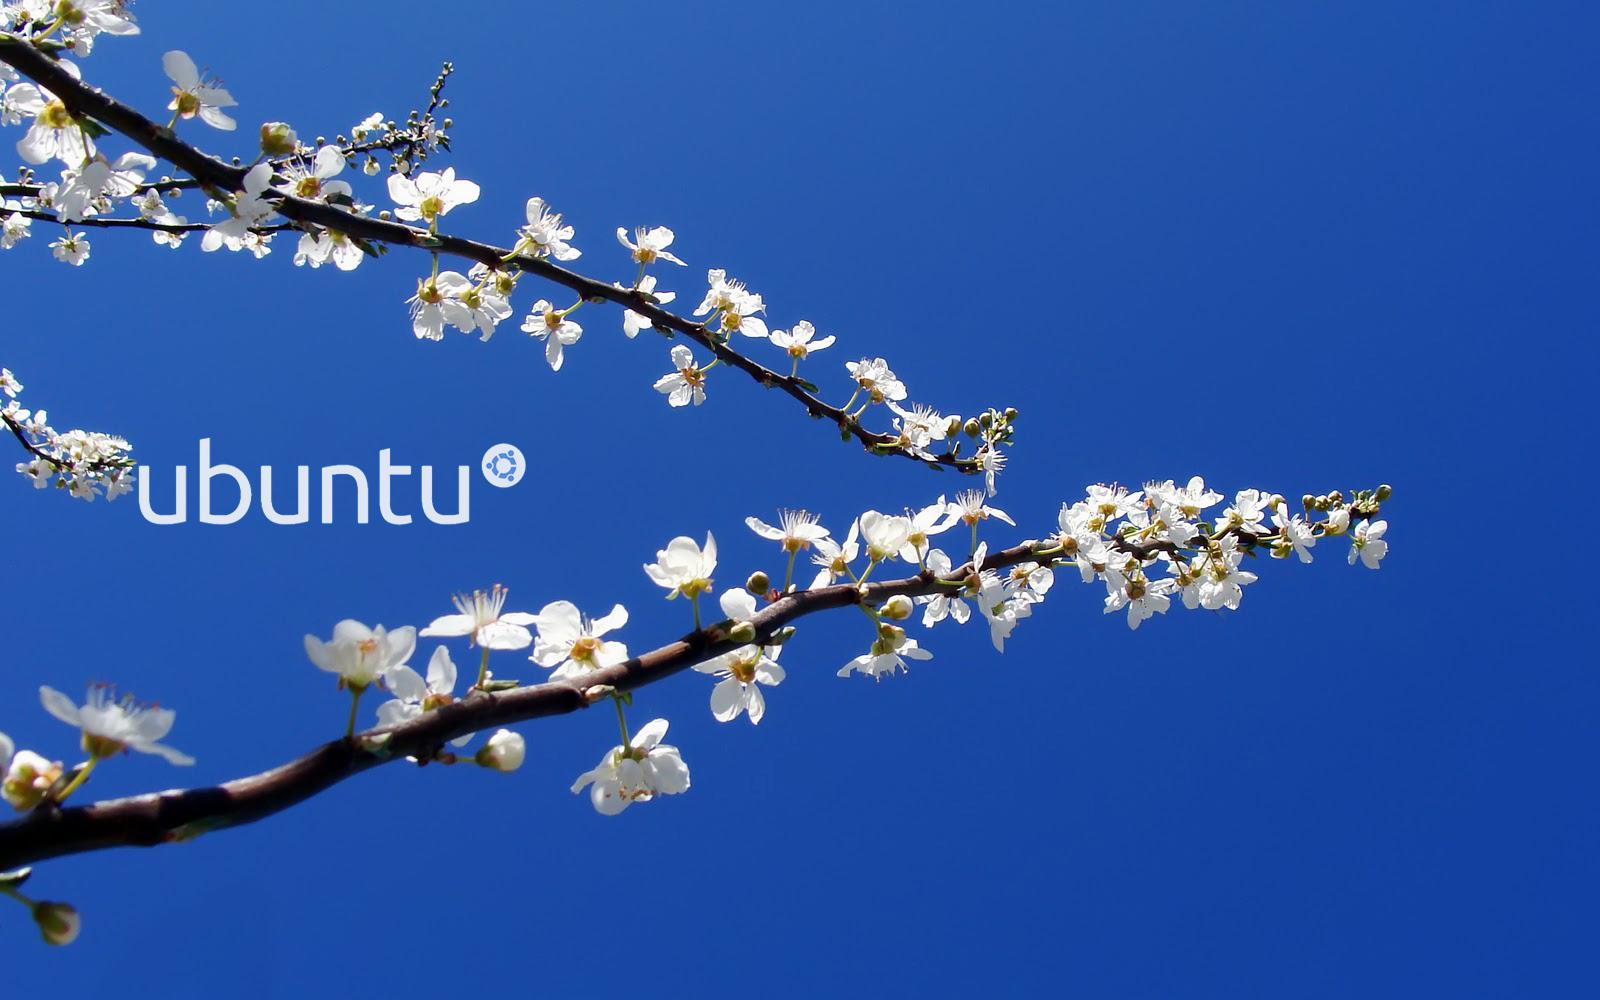 Ubuntu Blue Wallpaper